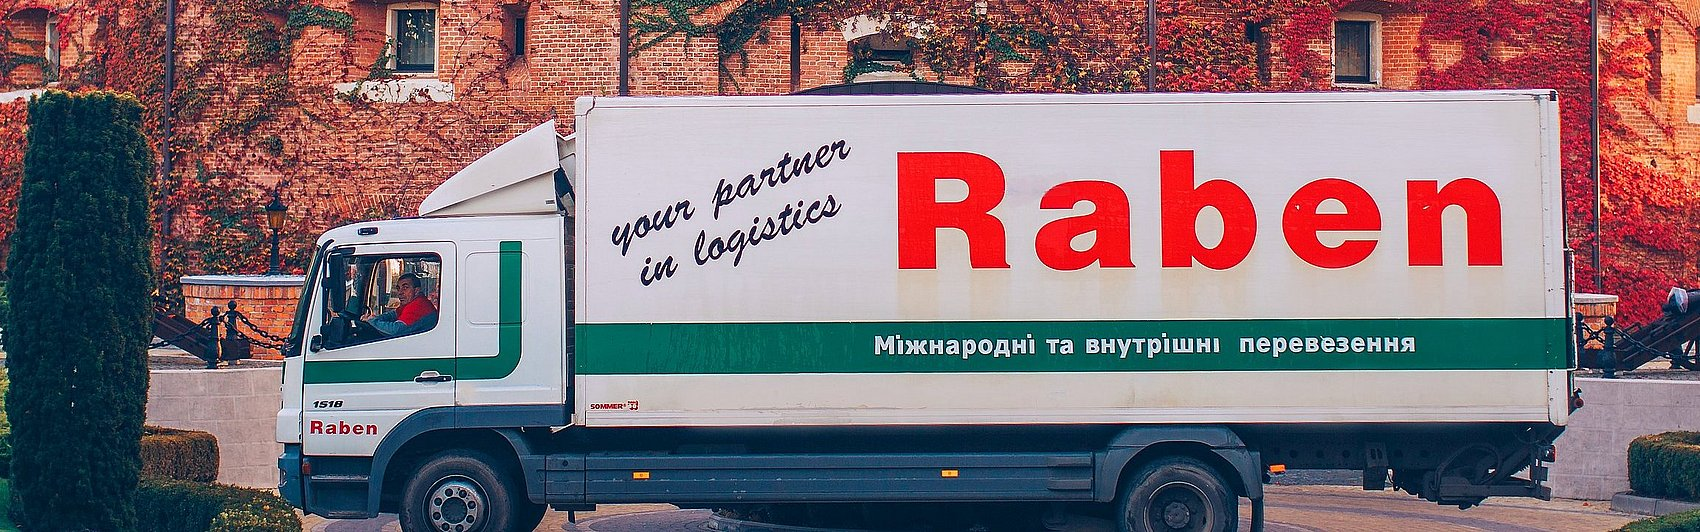 csm_csm_ukraina_17_c7f3ffe27b_c713642039.jpg